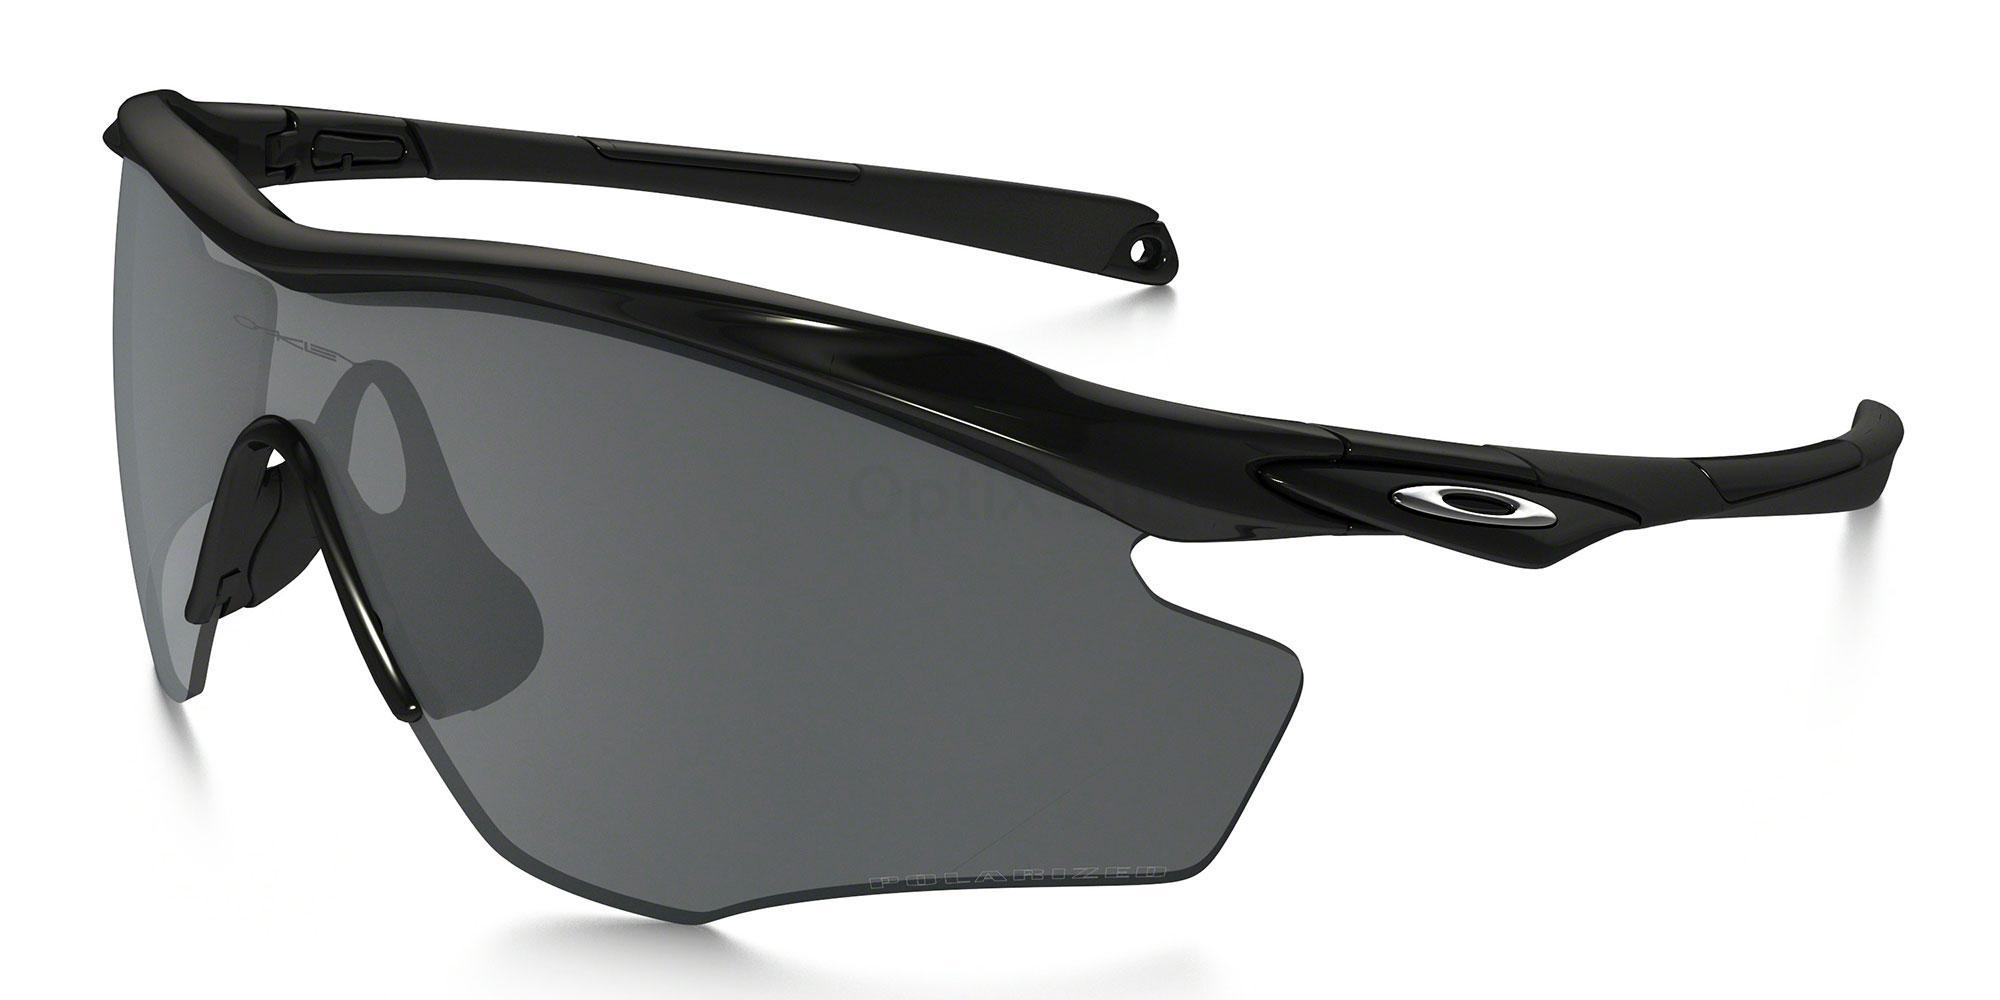 934309 OO9343 M2 FRAME XL Sunglasses, Oakley